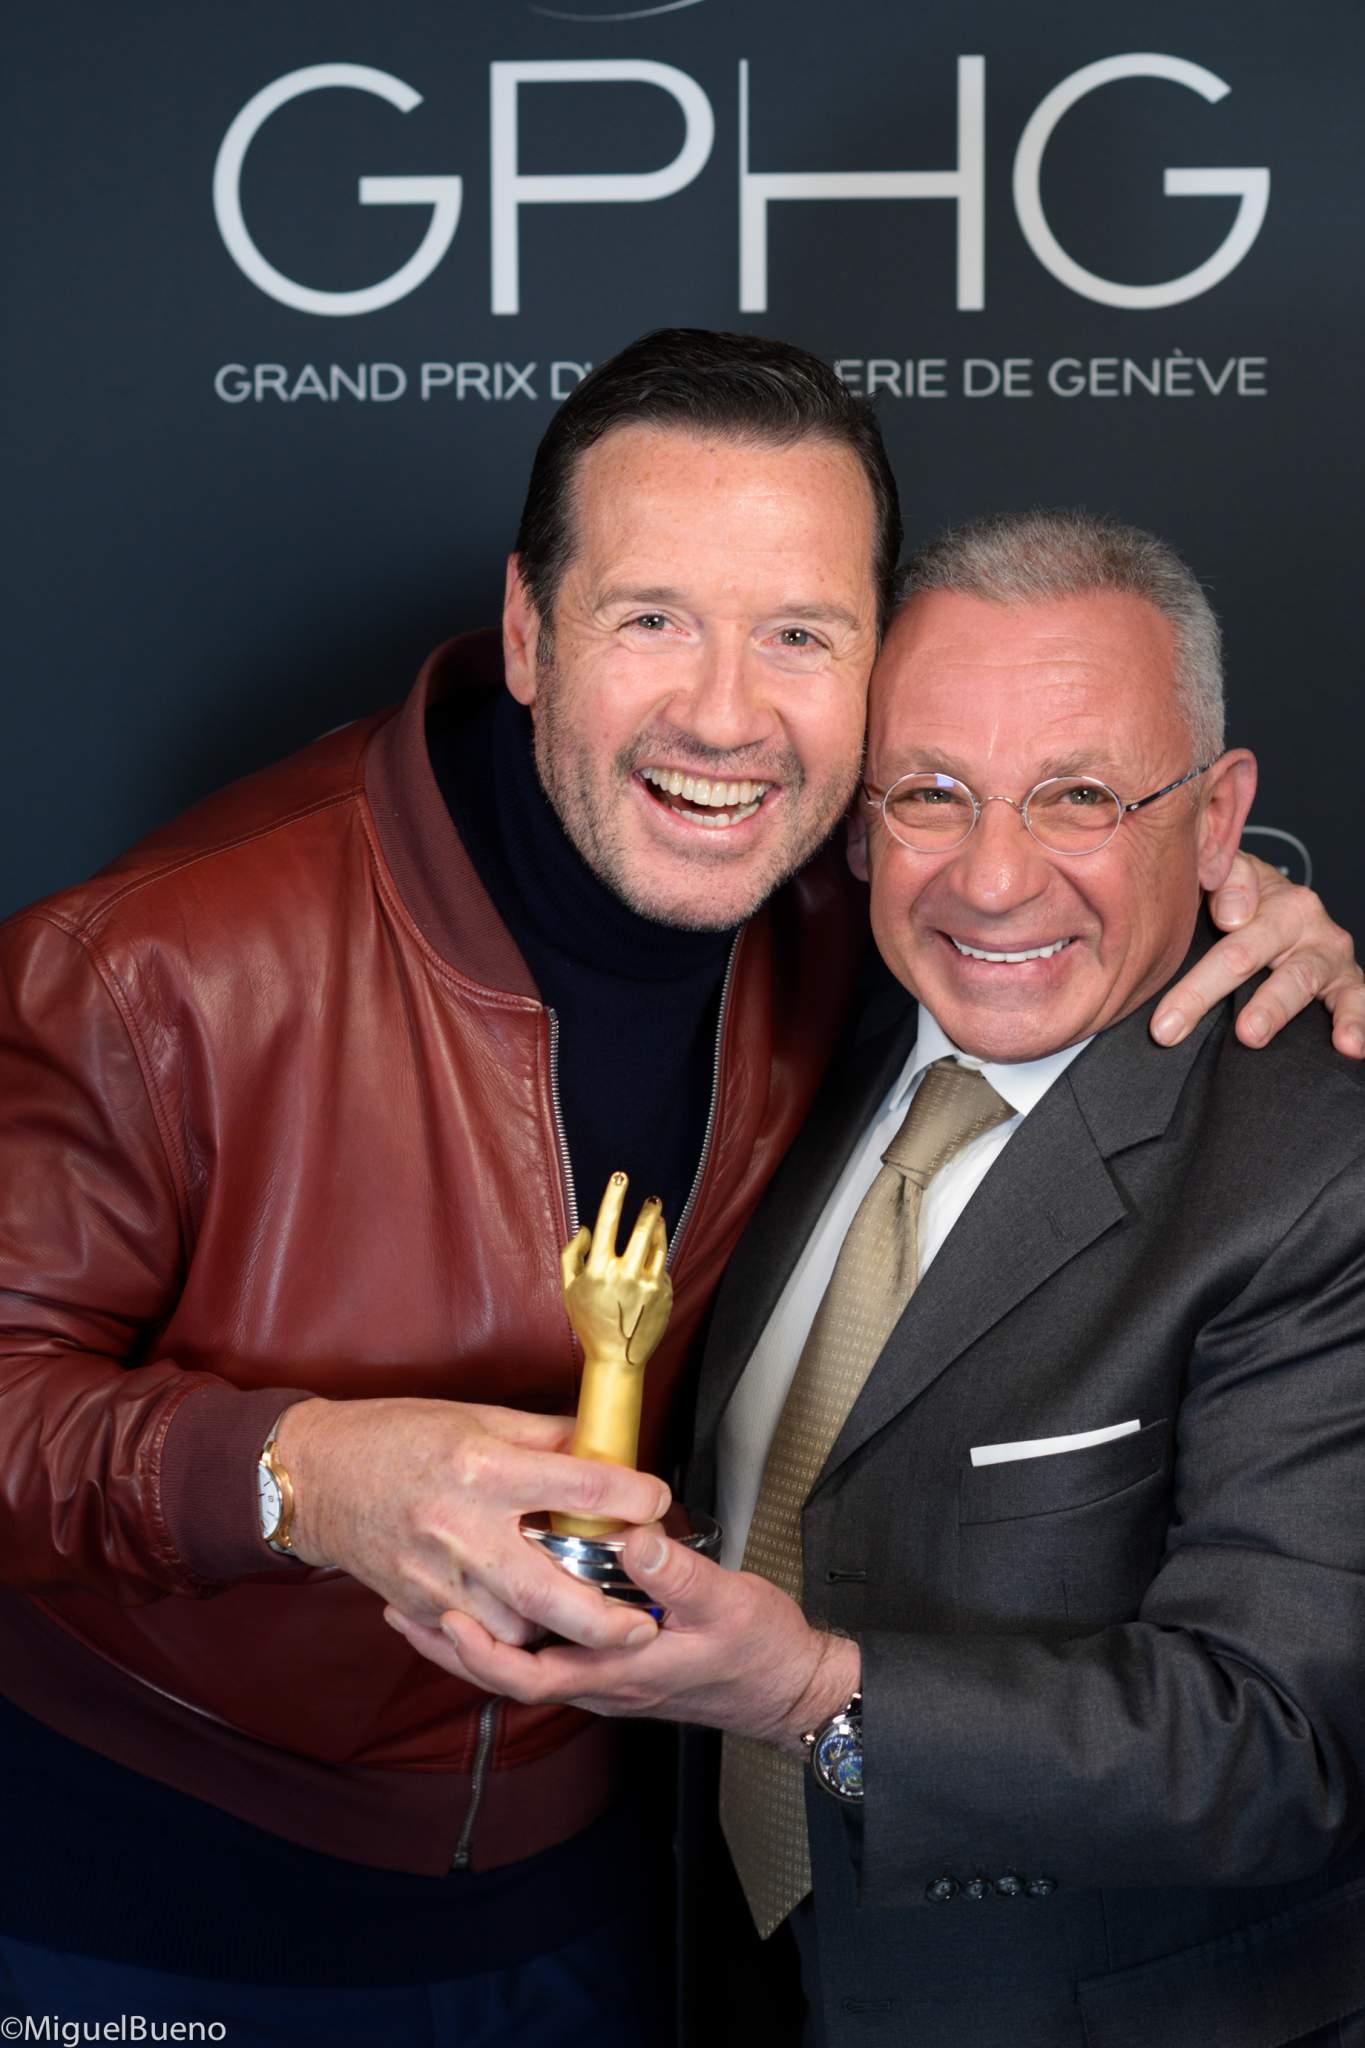 François-Henry Bennahmias et Pascal Raffy